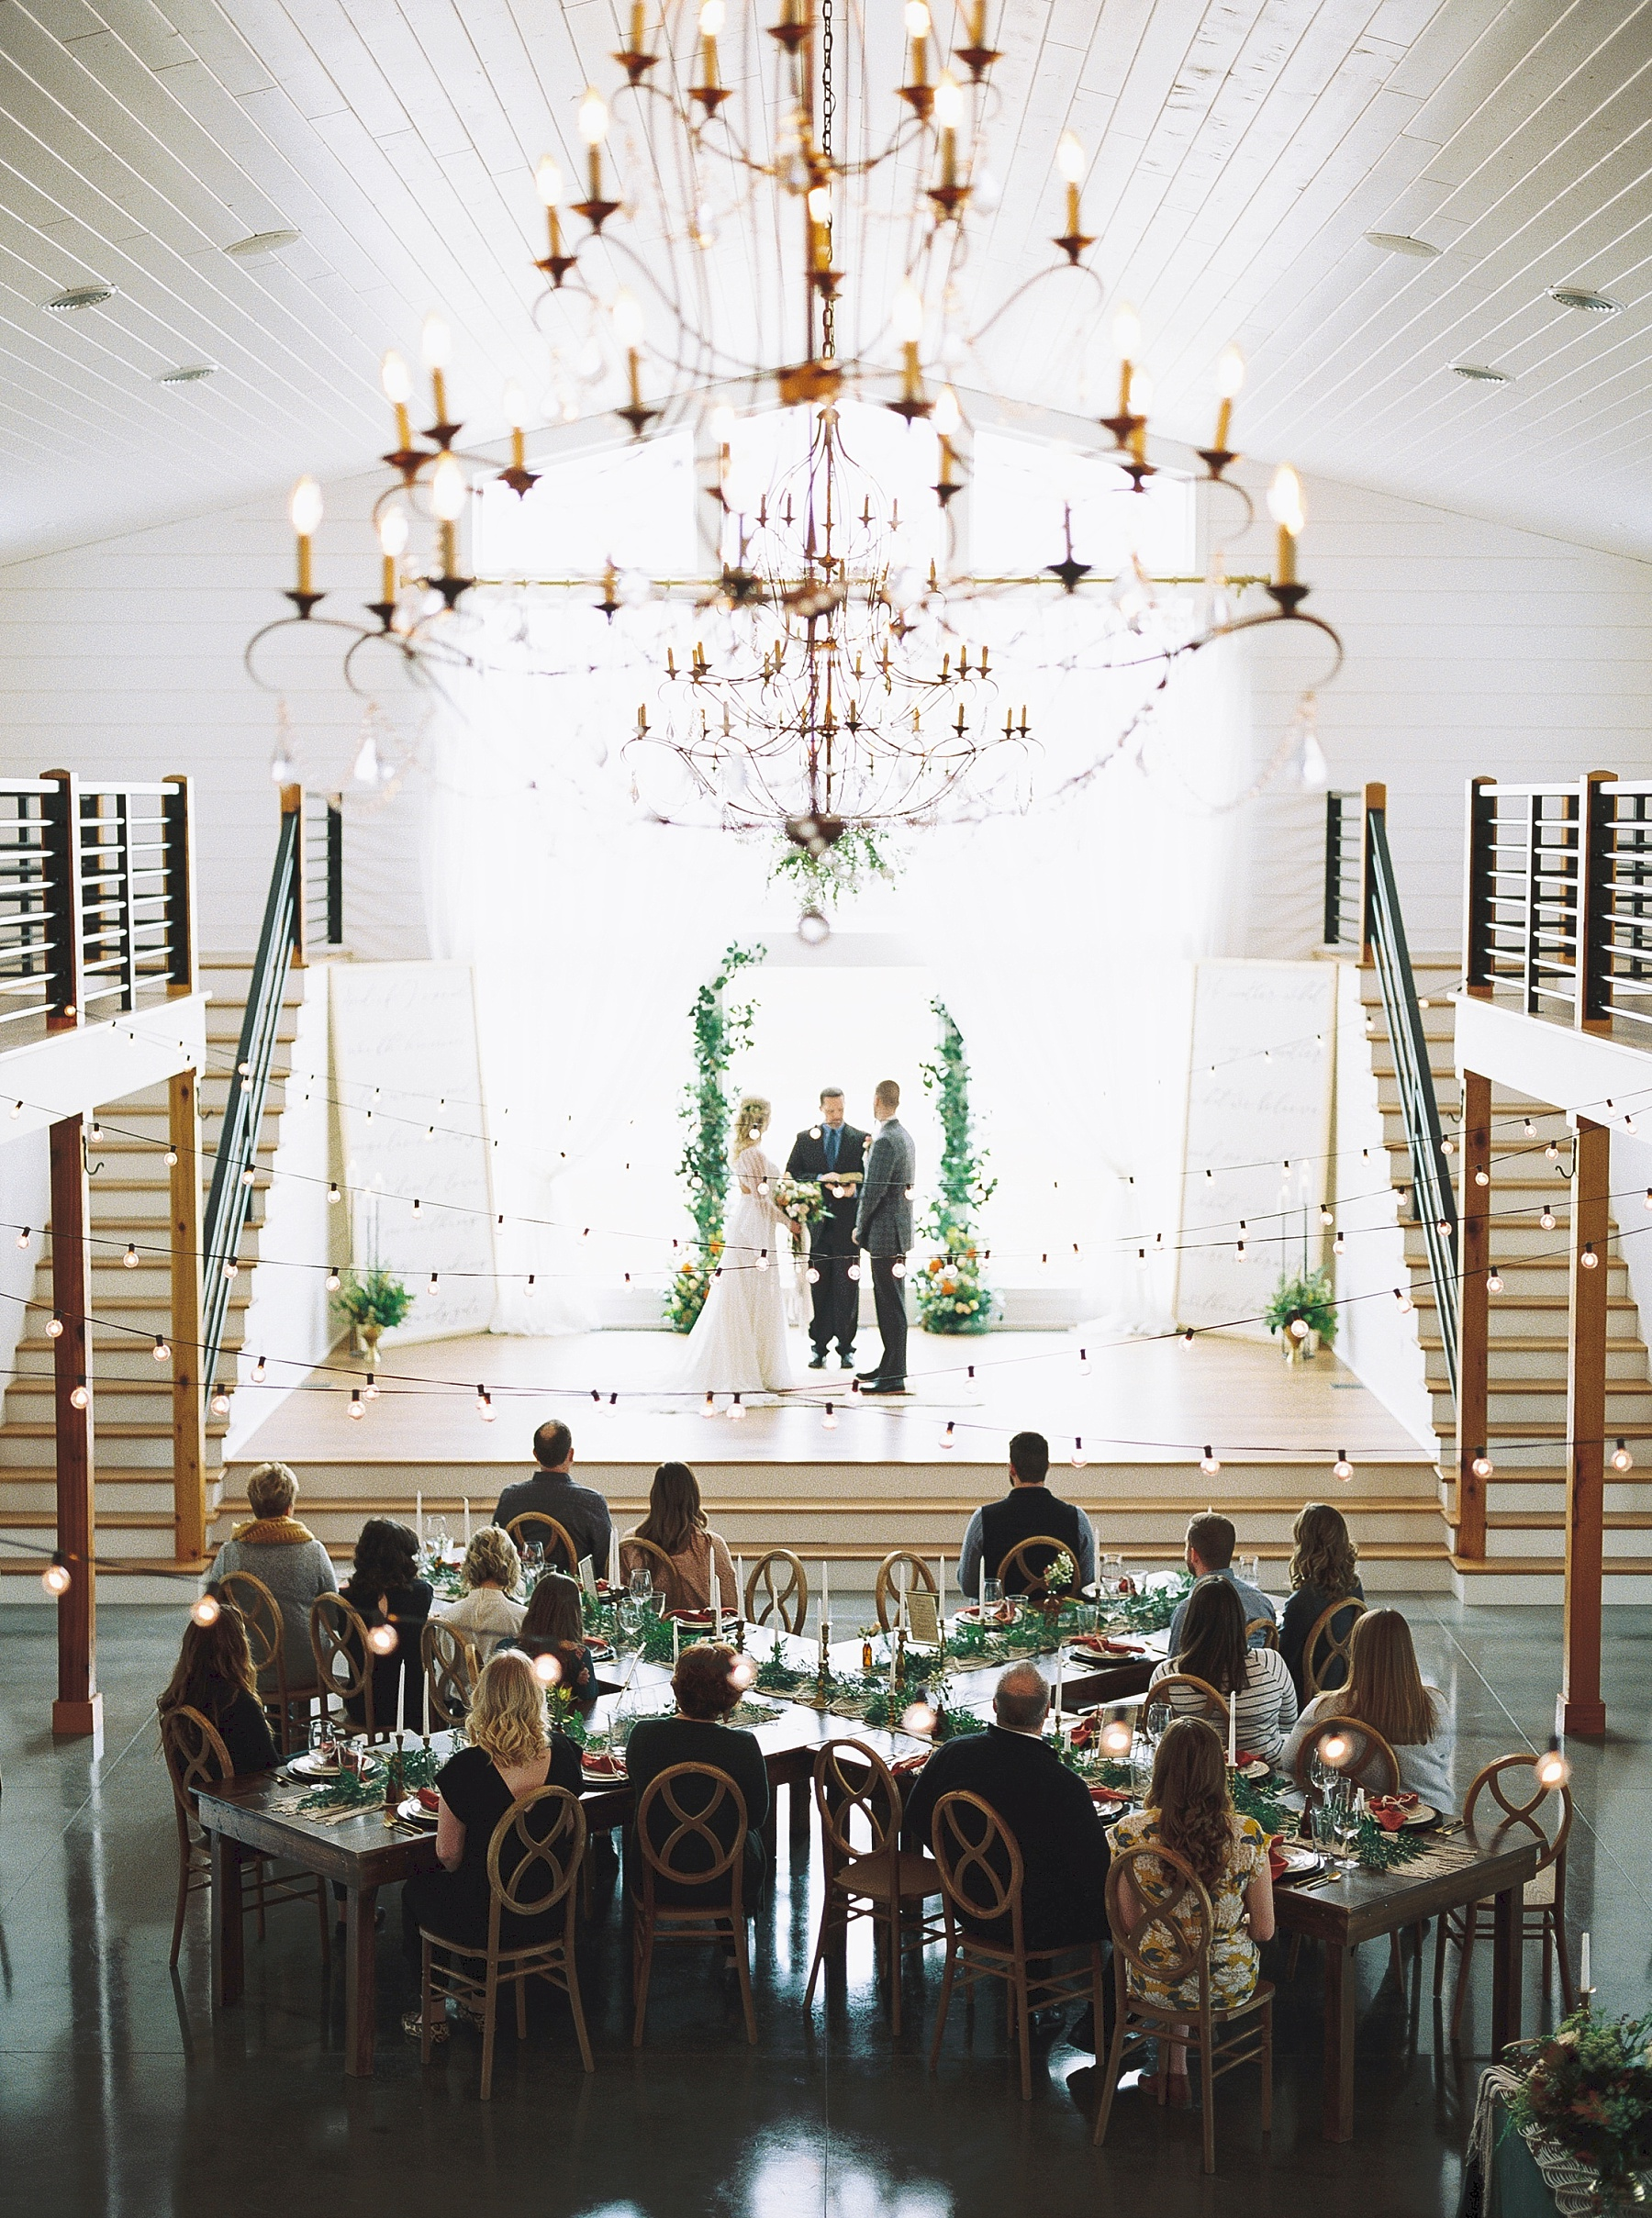 Eclectic Scandinavian Winter Wedding in All White Venue Emerson Fields by Kelsi Kliethermes Photography Best Missouri and Maui Wedding Photographer_0072.jpg